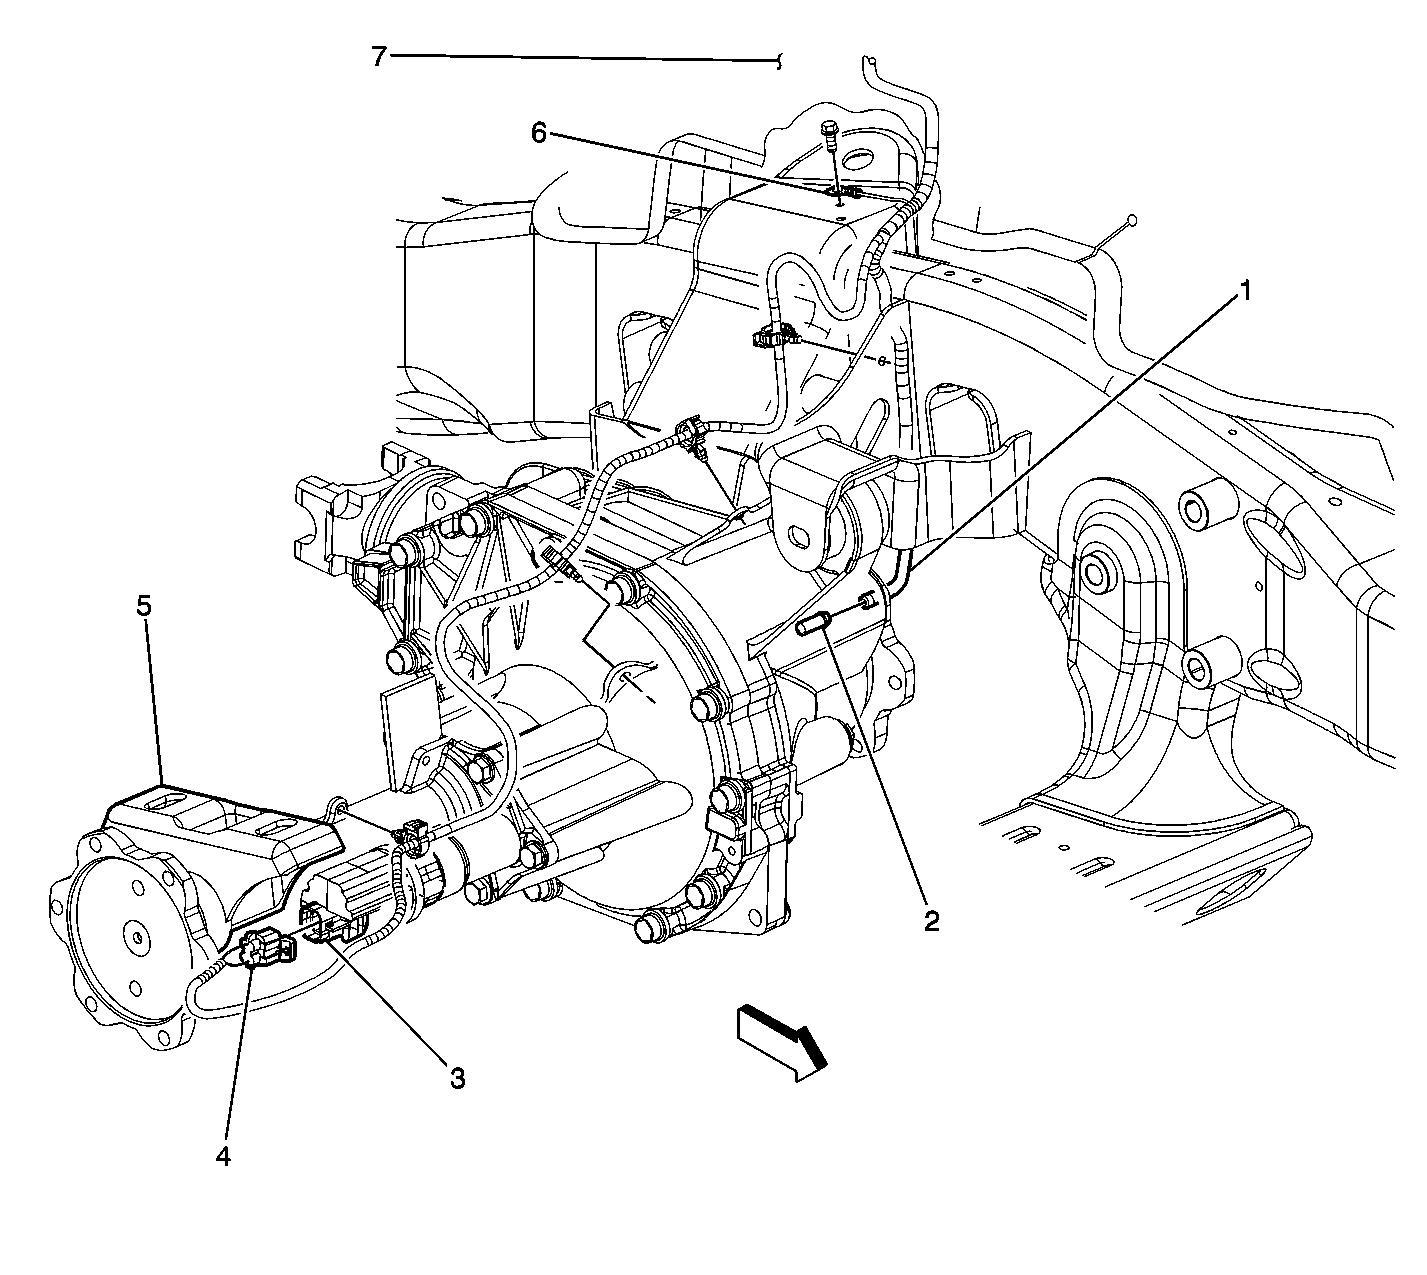 Transfer Case Wiring Diagram For Chevy Blazer